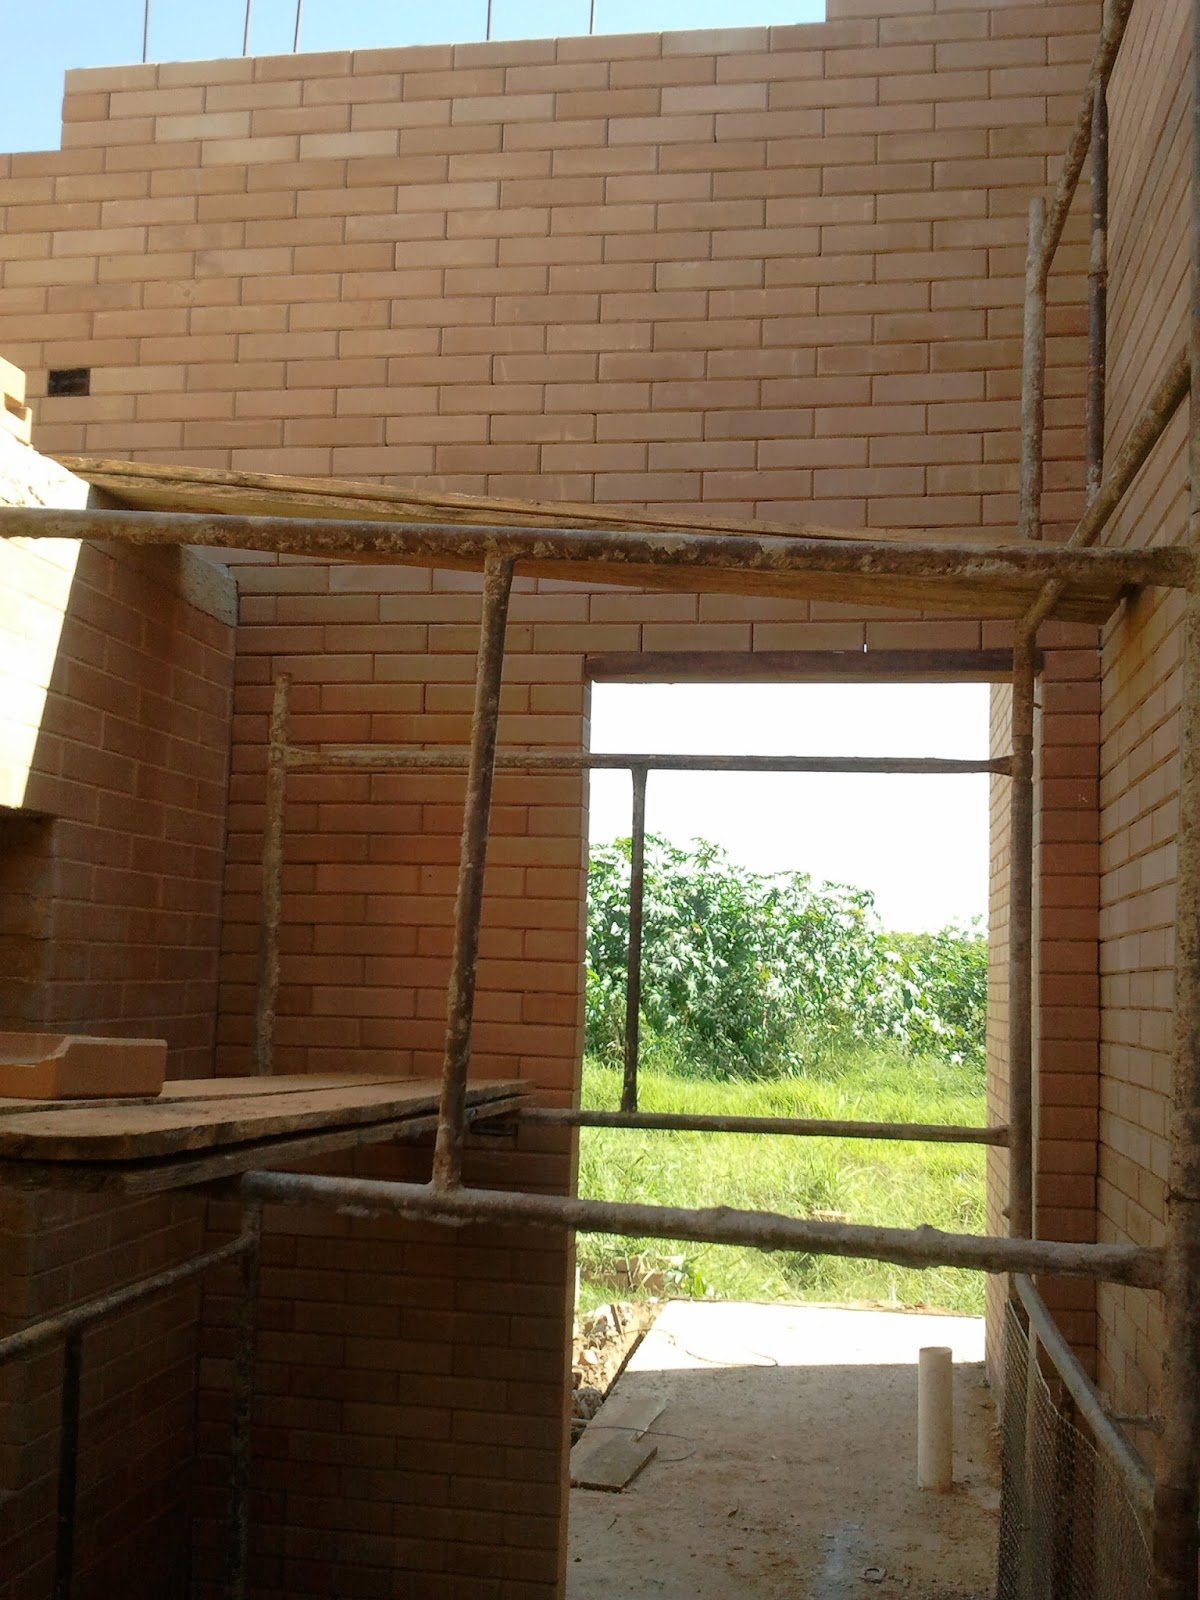 Construindo e Ampliando com Tijolo Solo cimento / Ecológico: Mezanino #8D9C2F 1200 1600